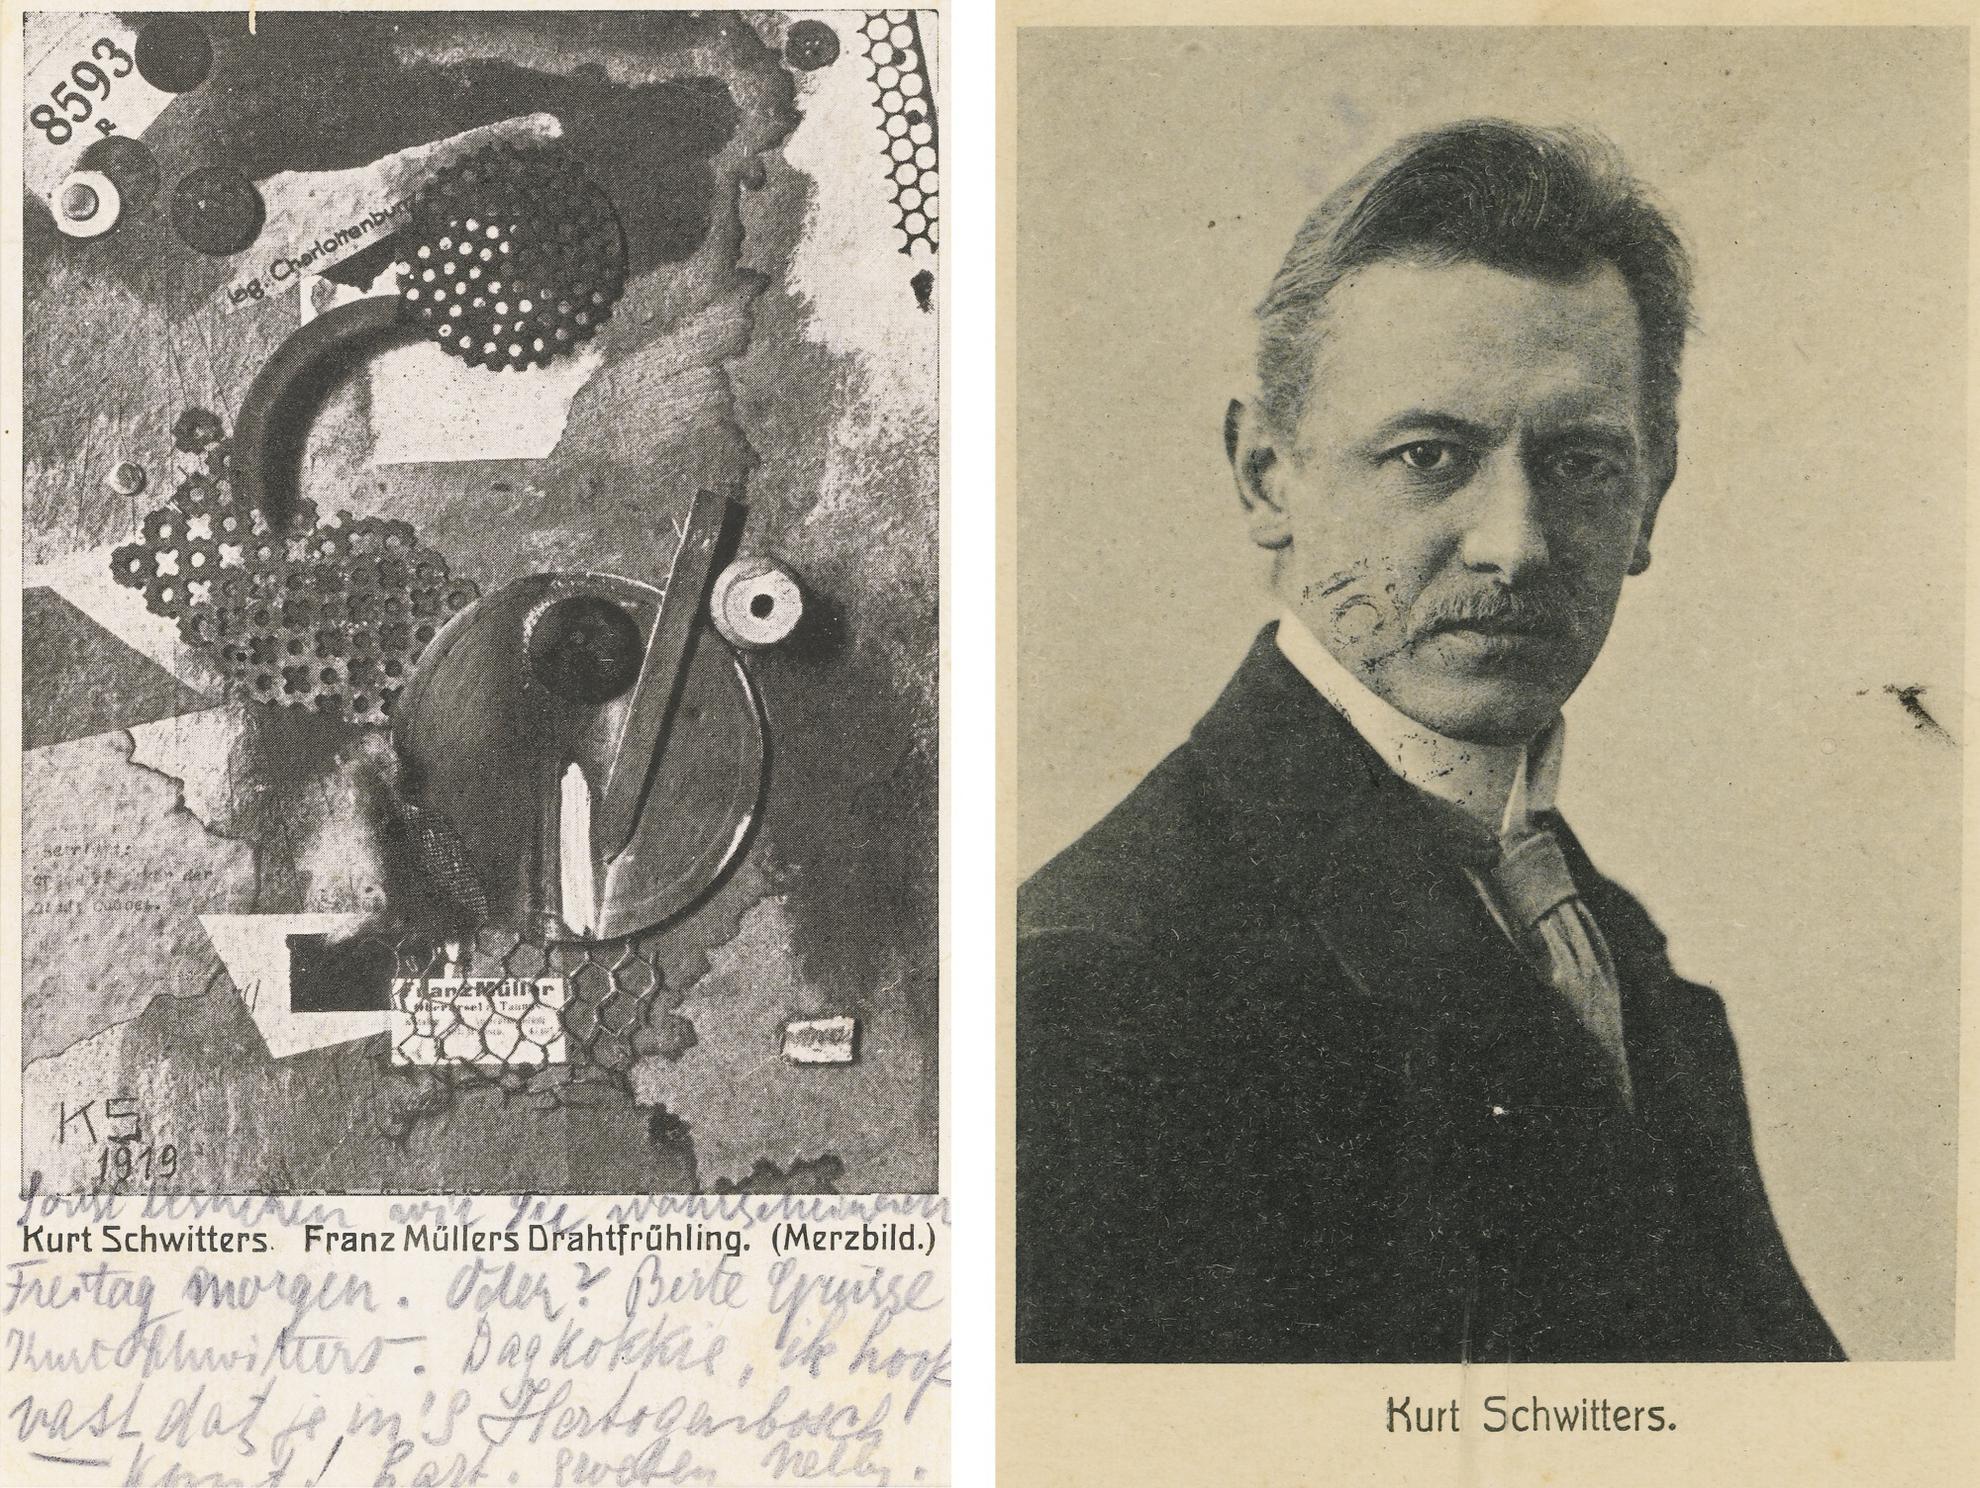 Kurt Schwitters-(i) Franz Mullers Drahtfruhling (Merz Bild) (Franz Mullers Wire Springtime (Merz Bild)) (ii) Veraltet-